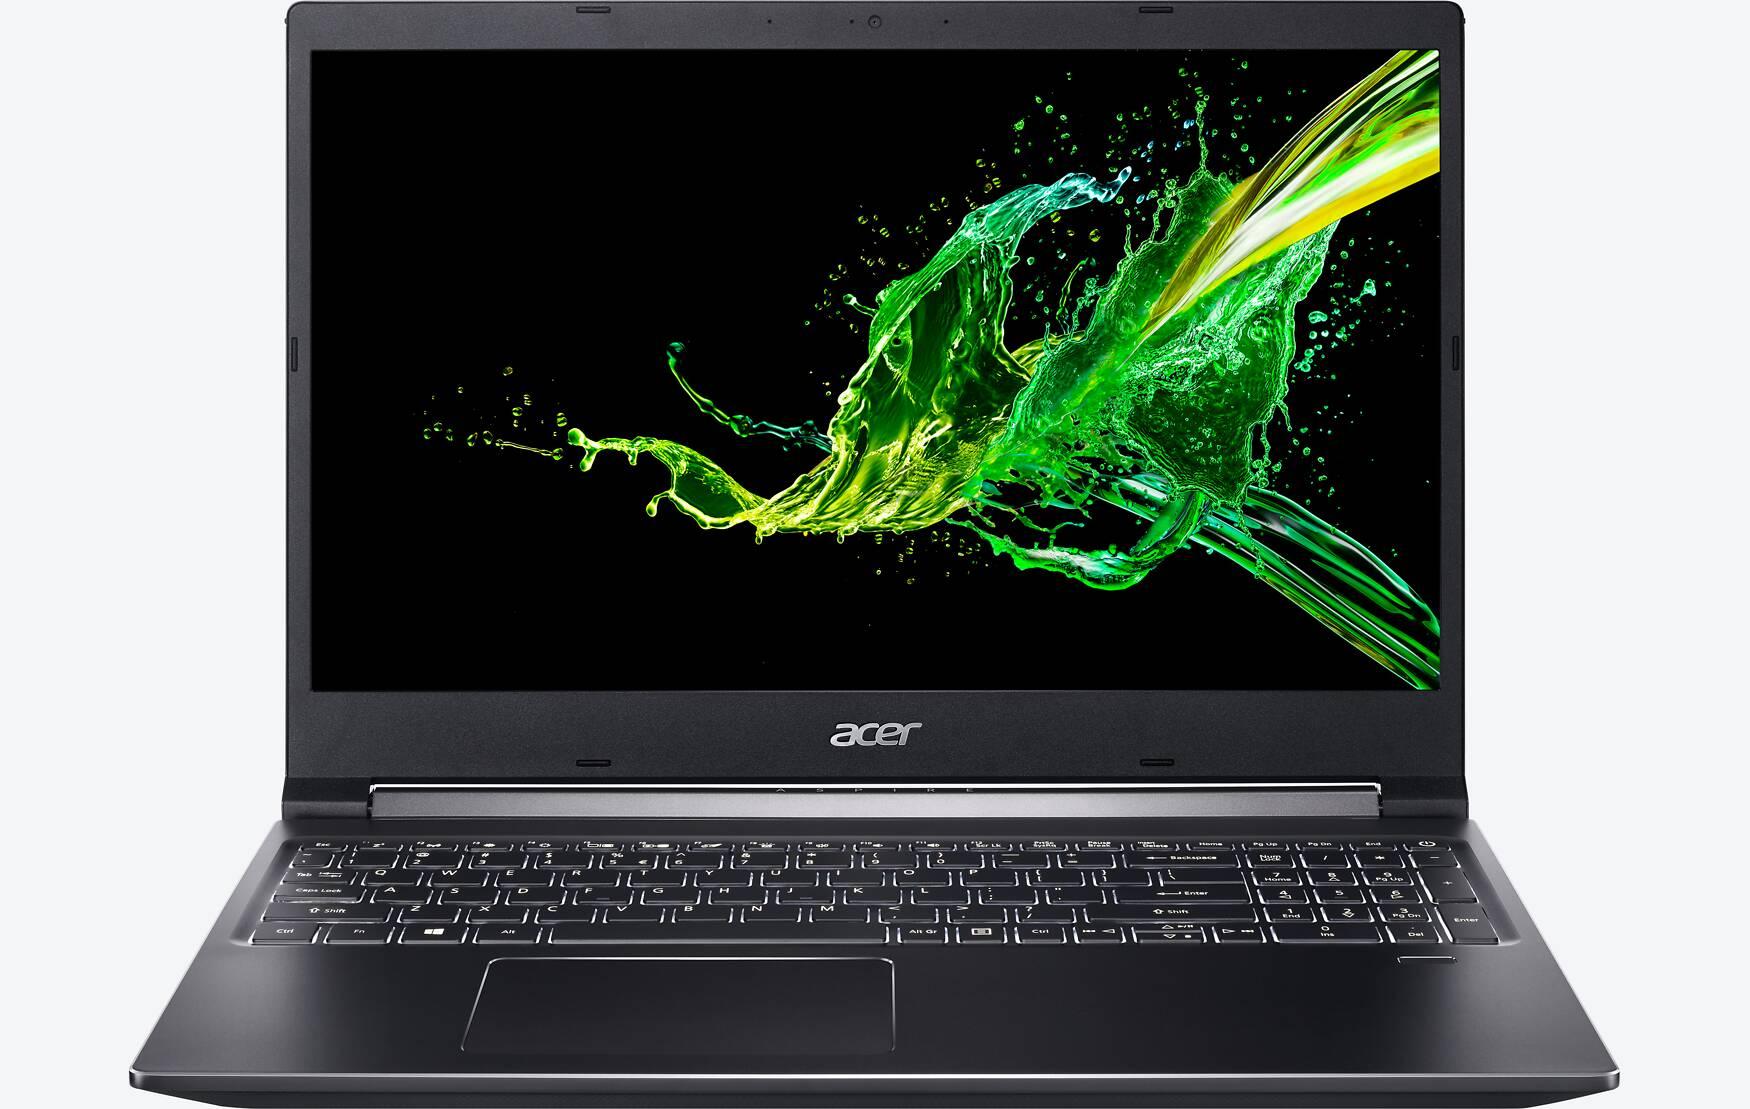 Acer Aspire 7 A715-74G-71CP